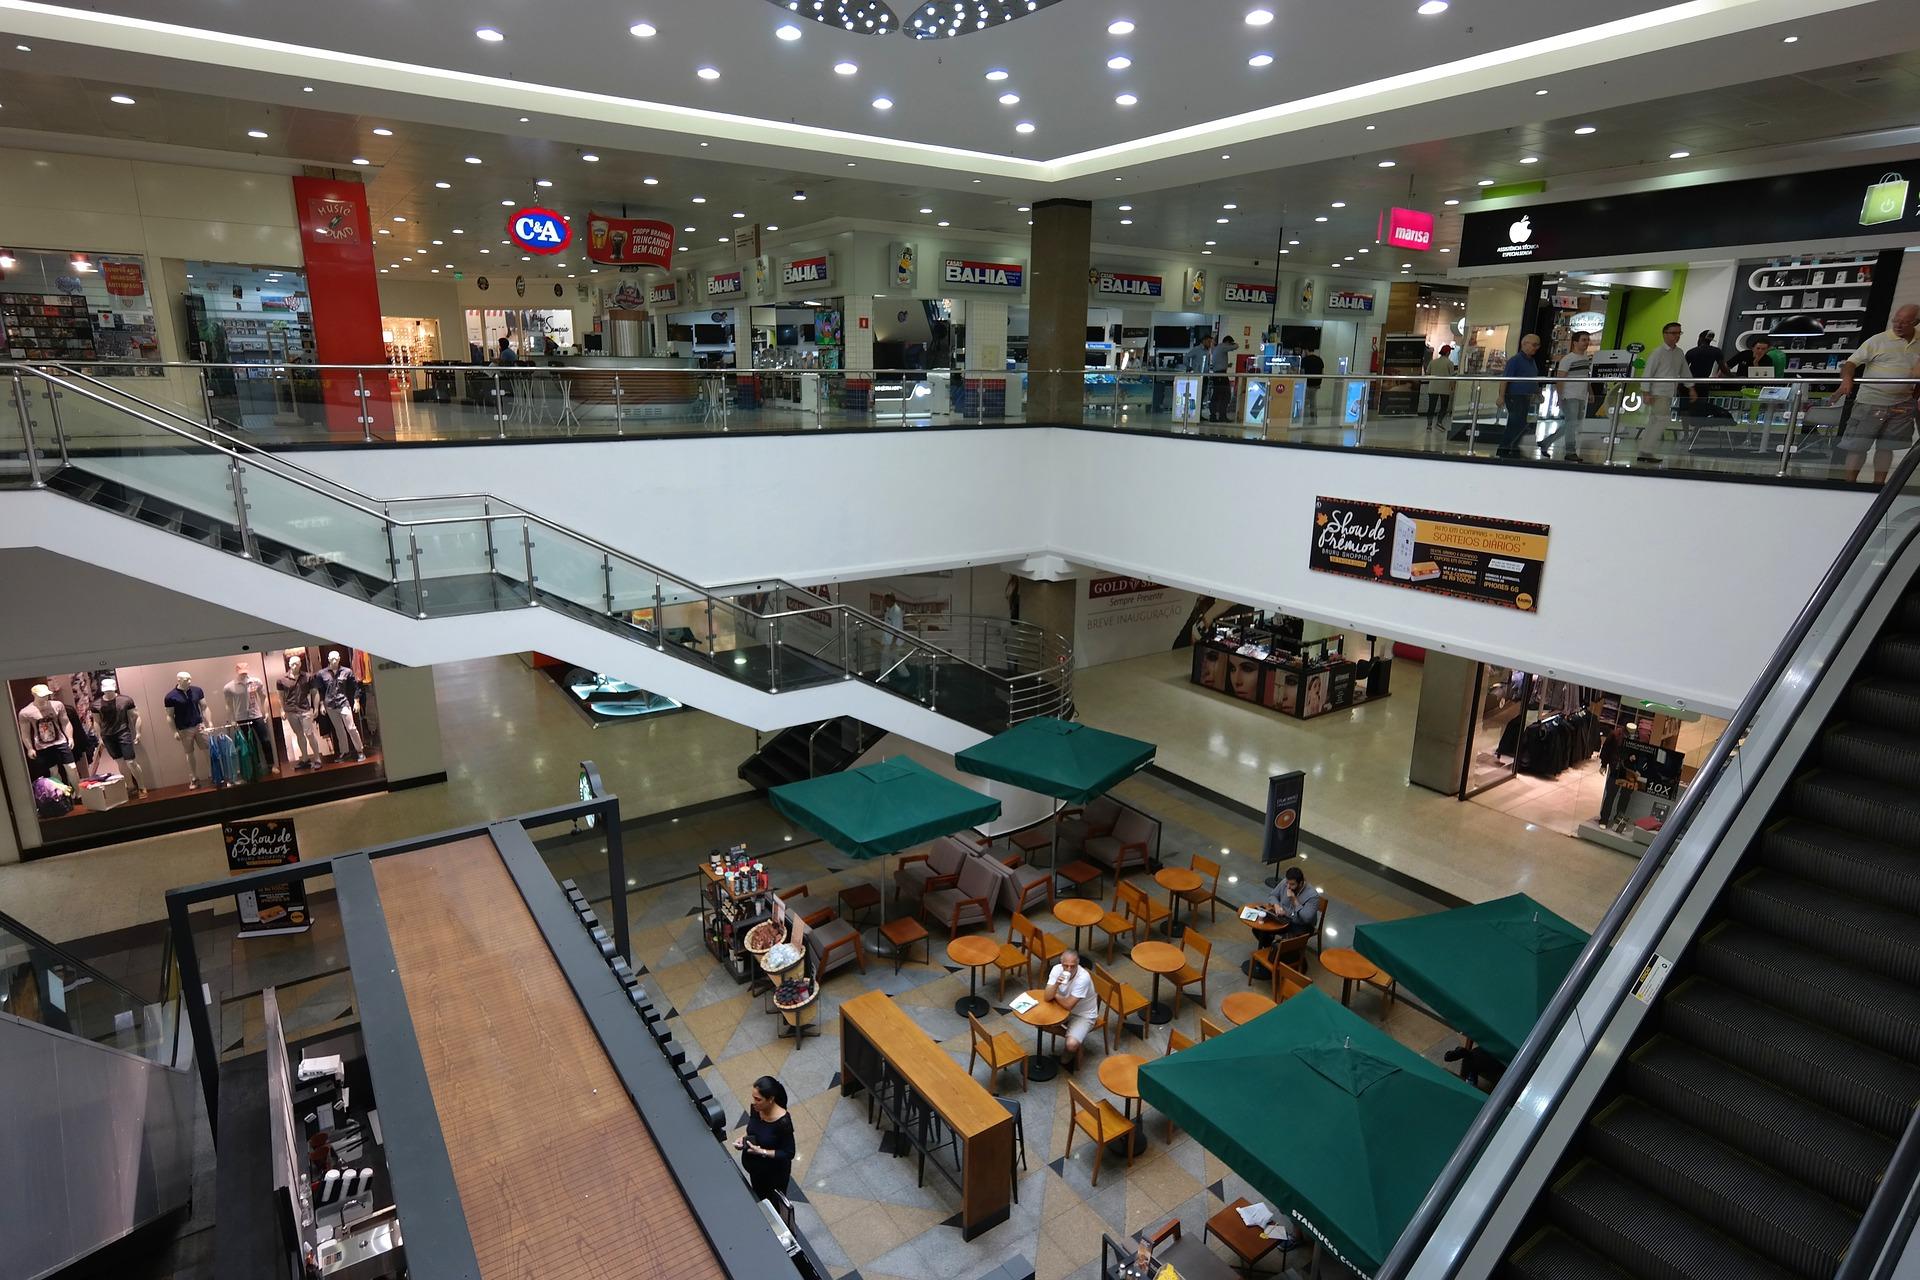 starbucks-inside-a-mall